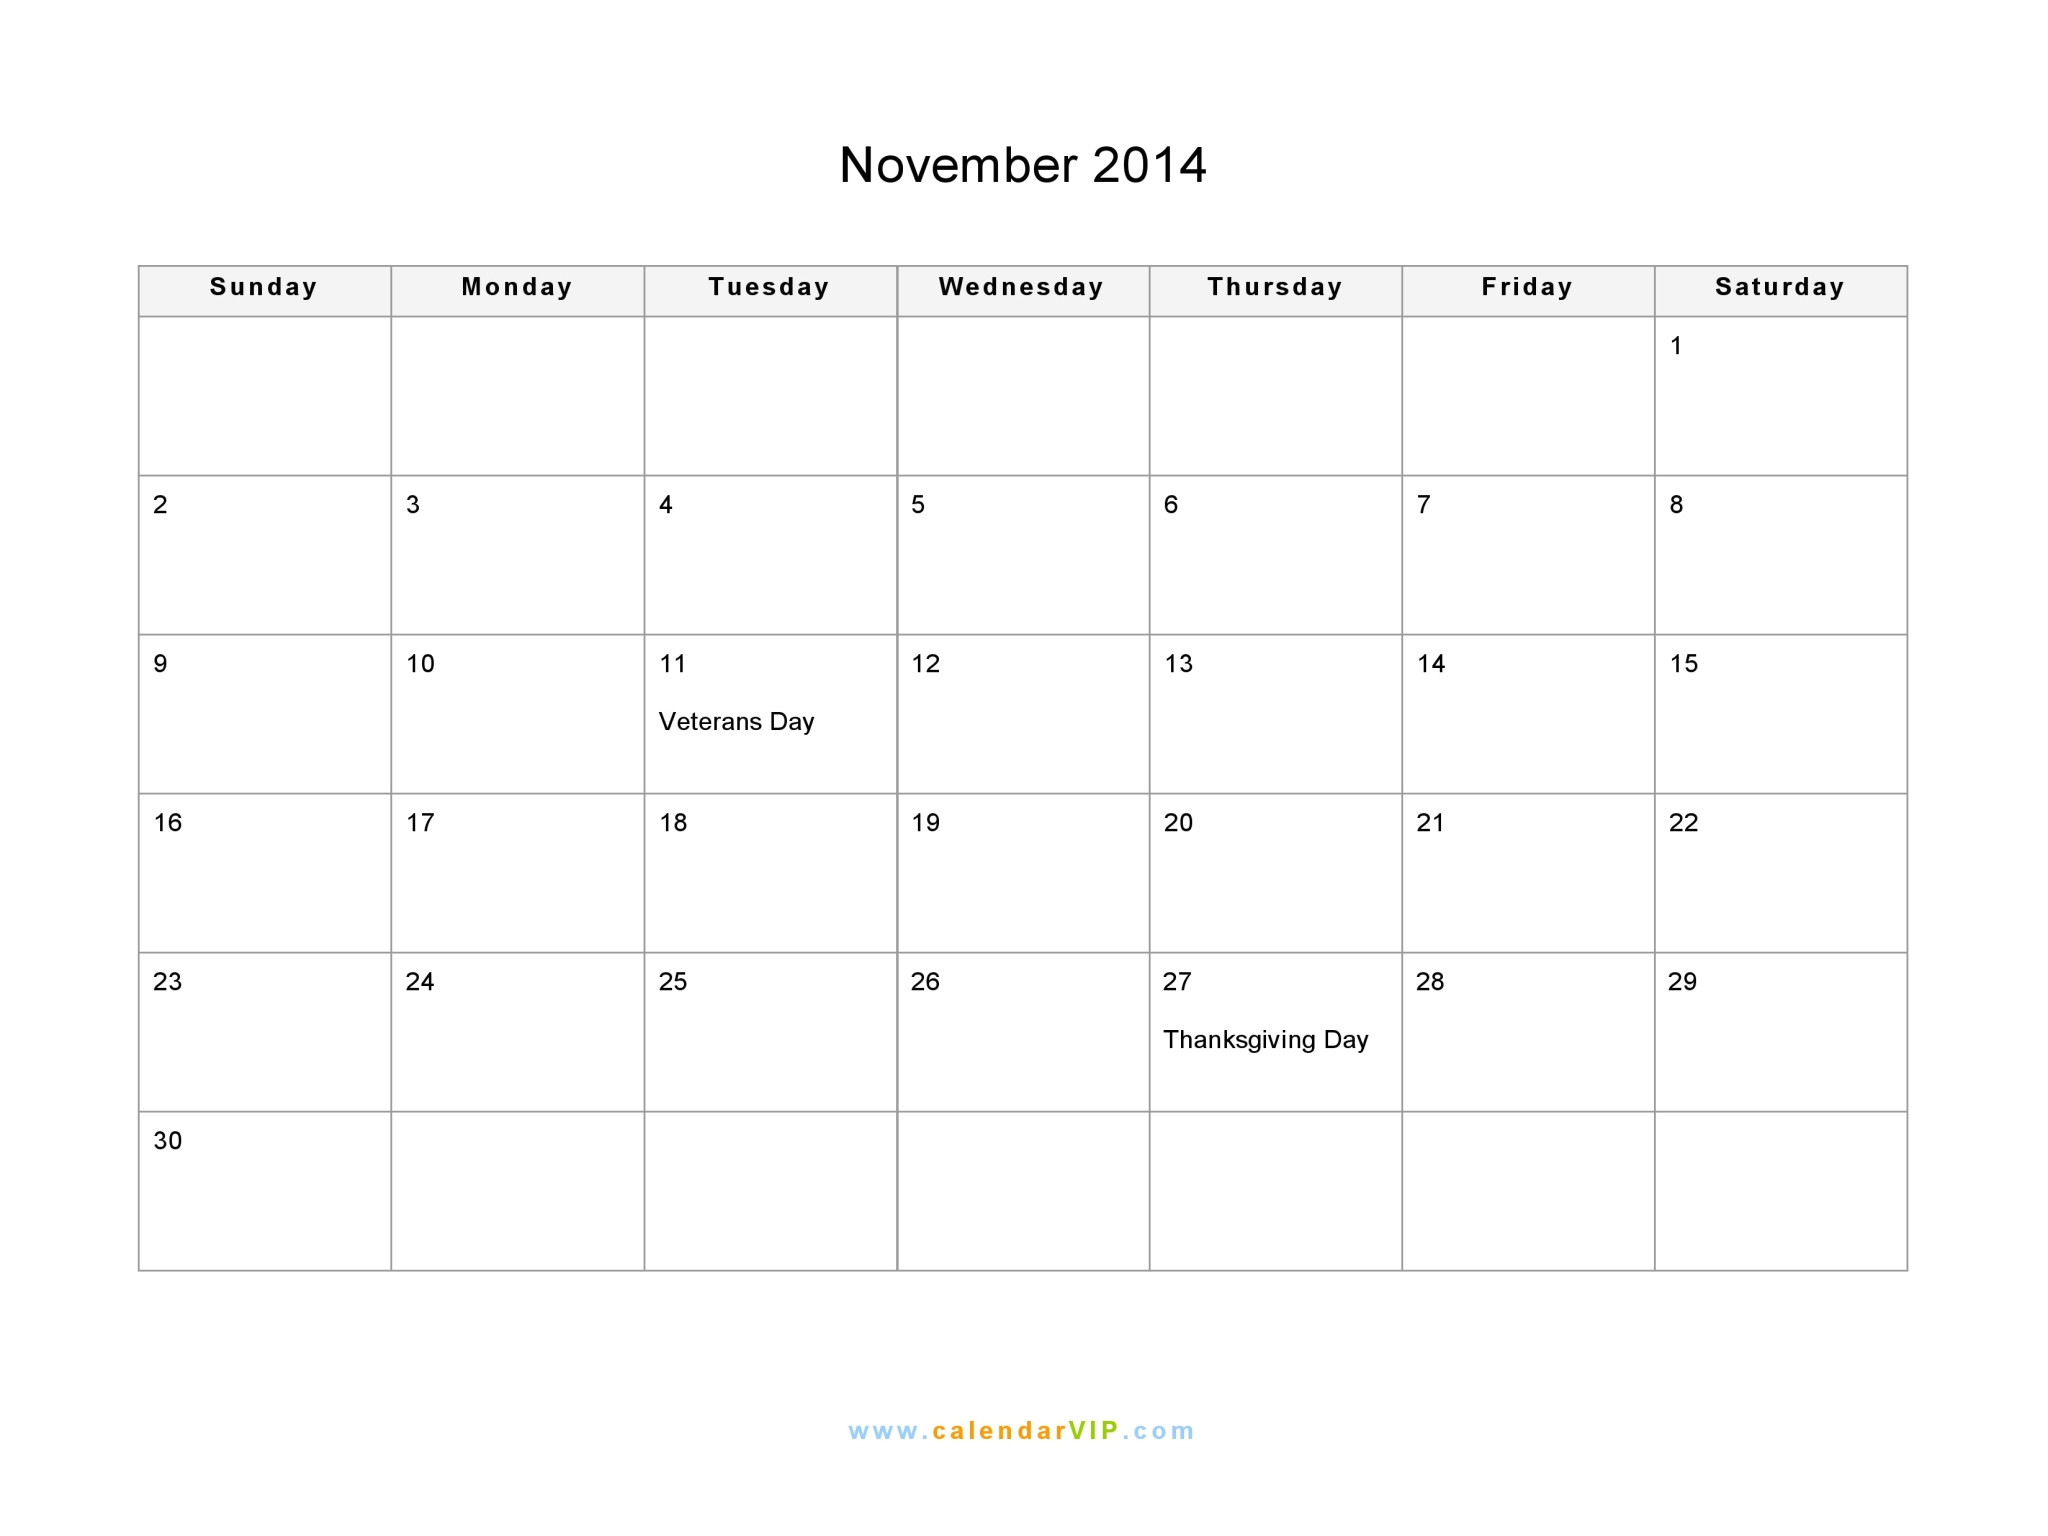 Blank Calendar Template November 2014 November 2014 Calendar Blank Printable Calendar Template